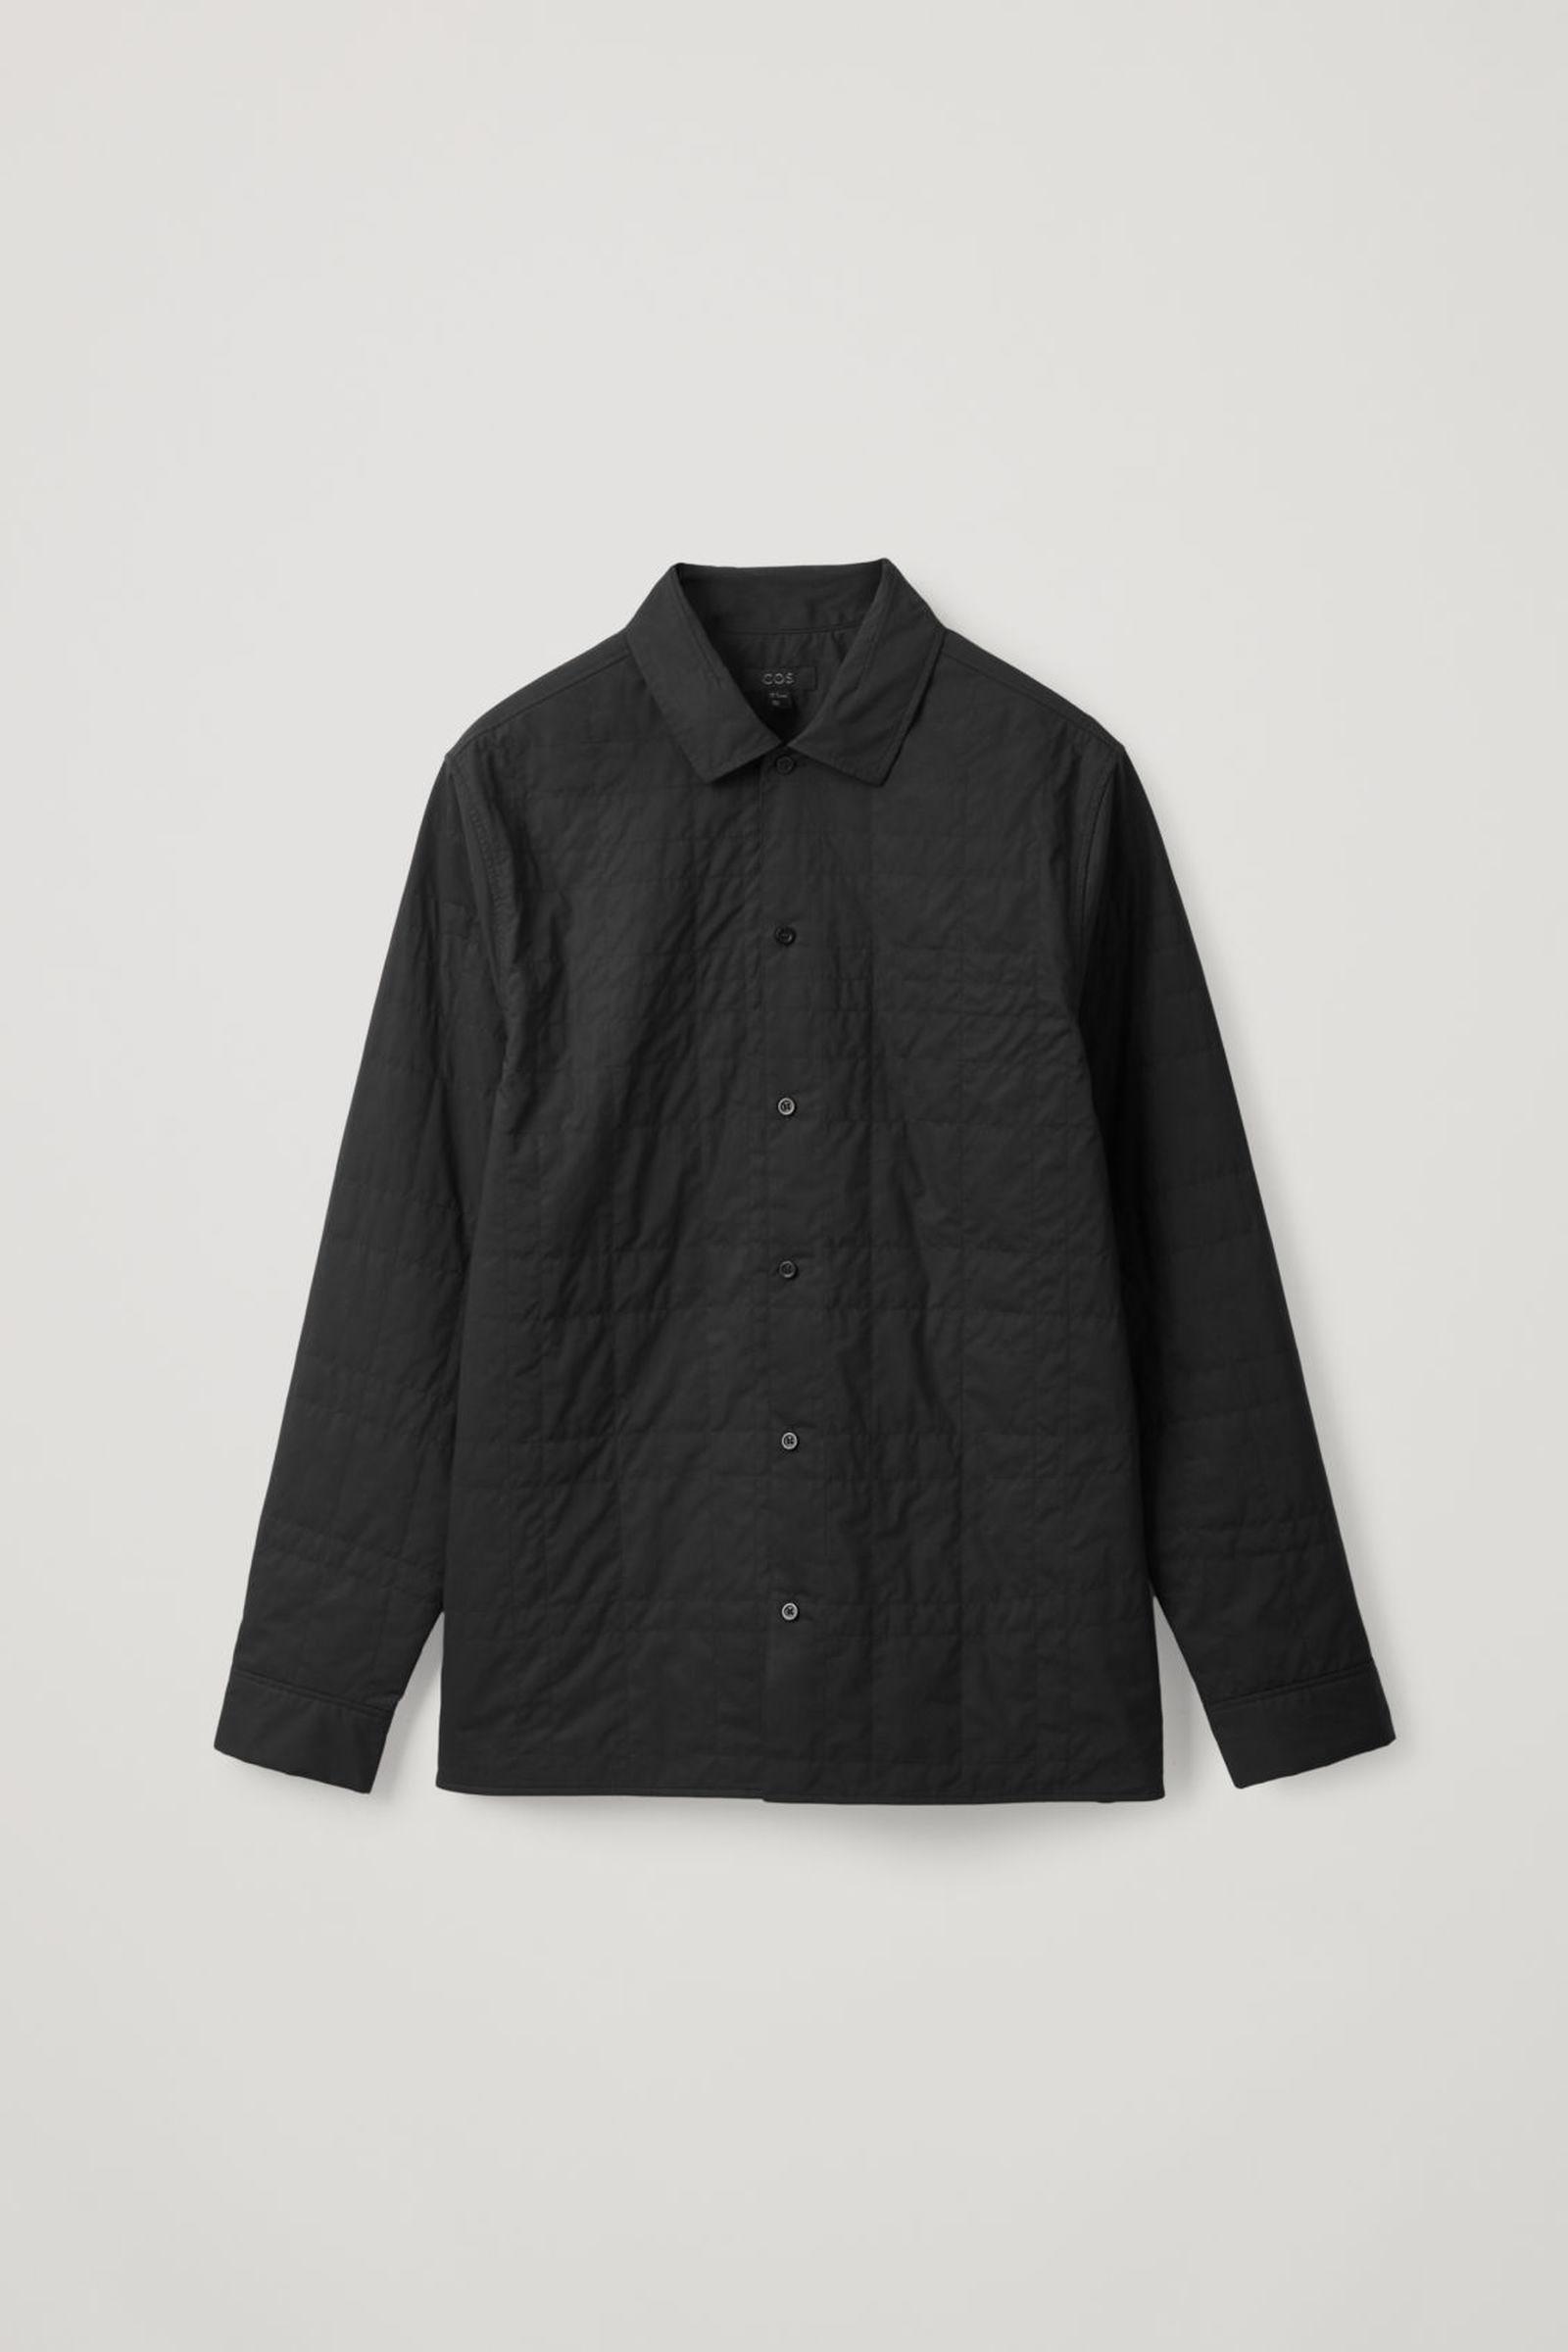 COS 퀼팅 코튼 셔츠의 블랙컬러 Product입니다.